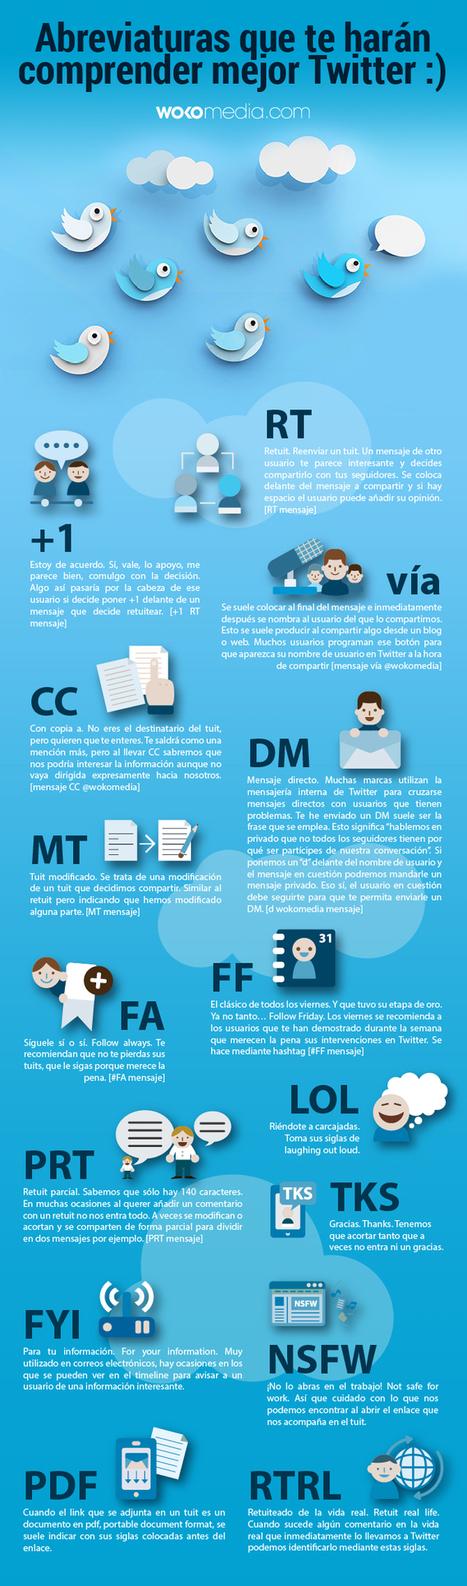 Abreviaturas clave en Twitter | Ofertas de empleo, Crea tu empresa | Scoop.it